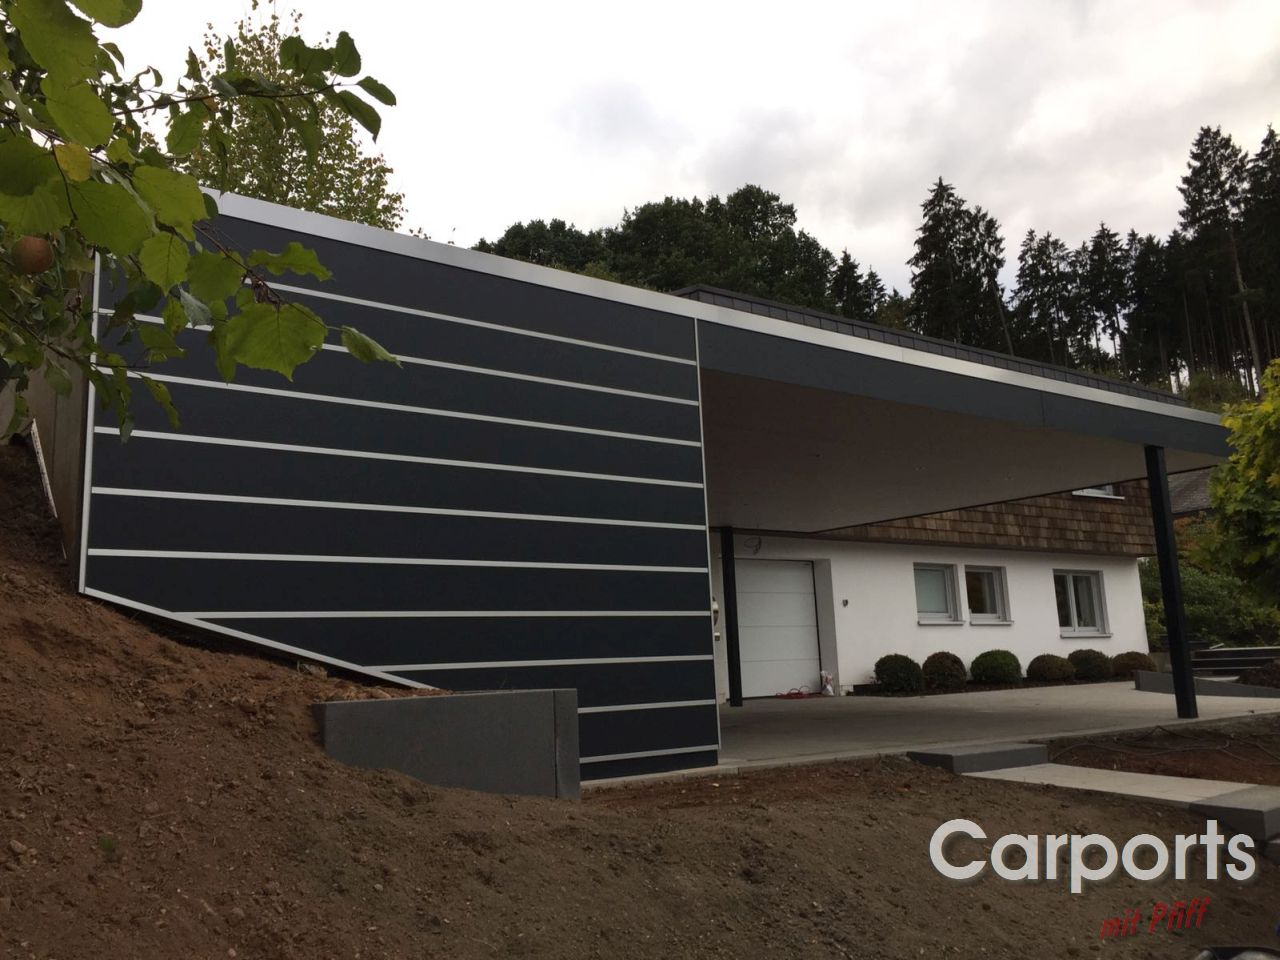 doppelcarport carport bauhaus mit abstellraum aus hpl trespa. Black Bedroom Furniture Sets. Home Design Ideas